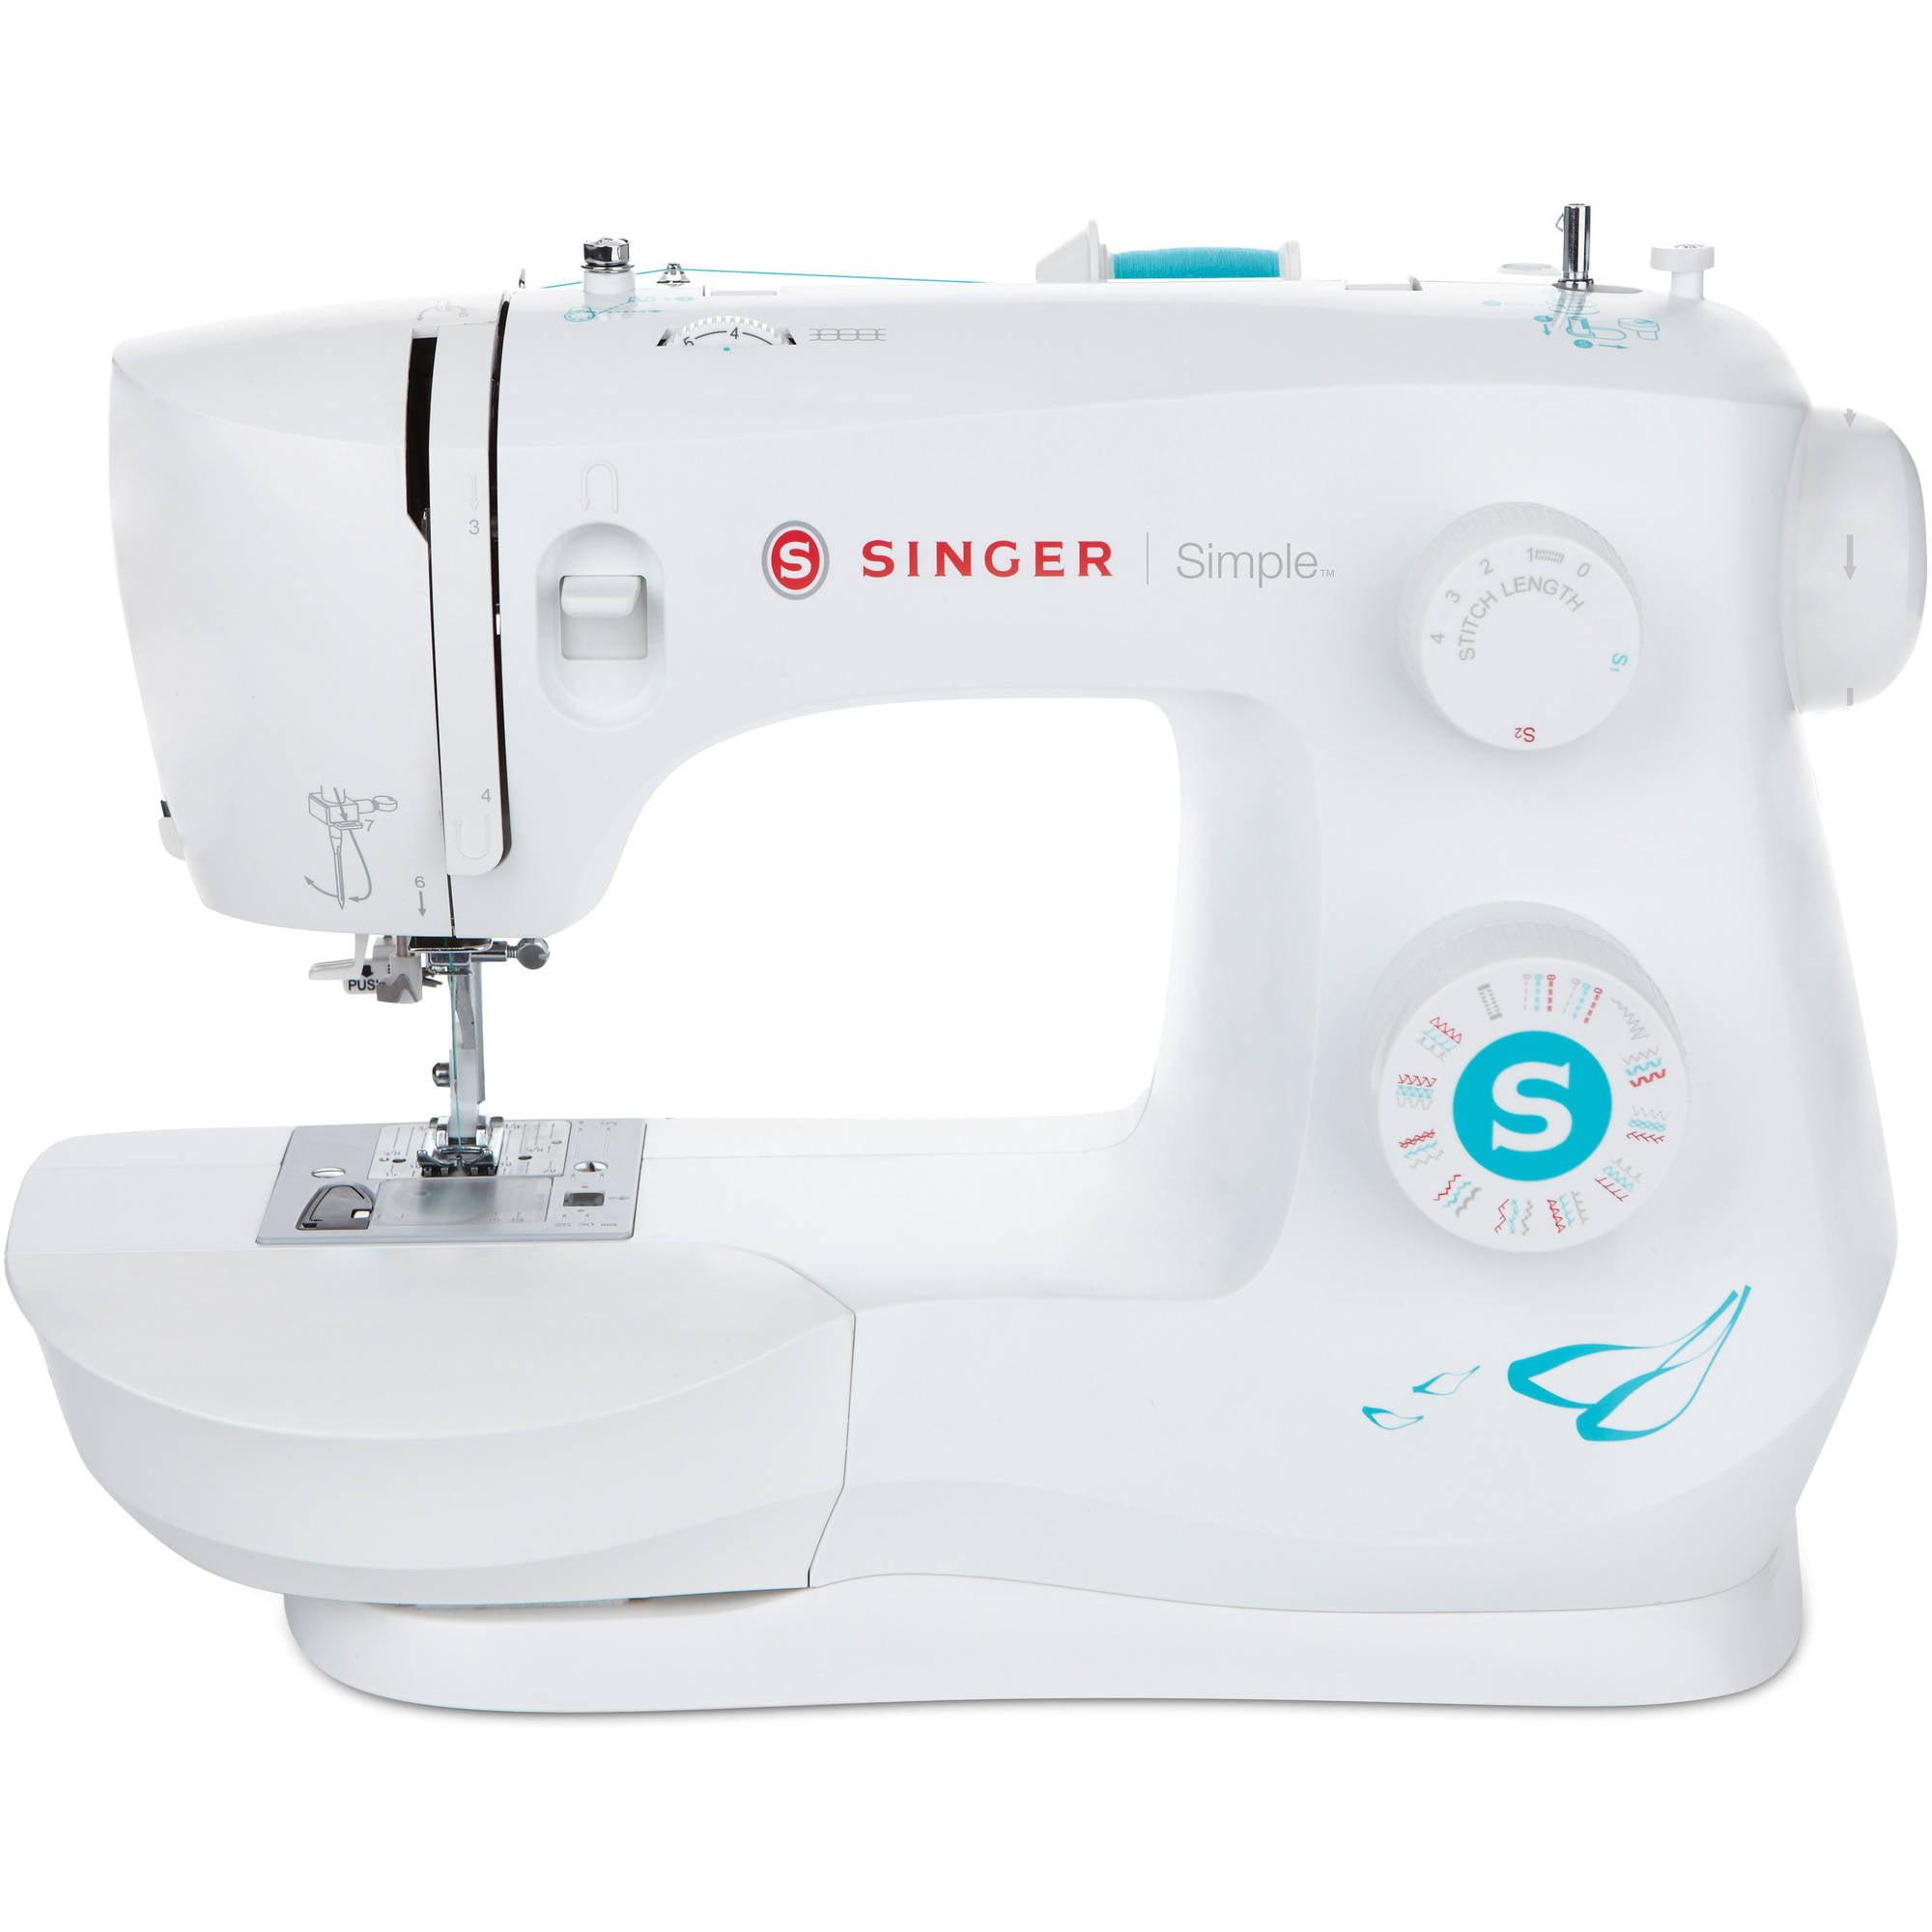 Singer 3337 Simple 29-stitch Sewing Machine - Walmart.com